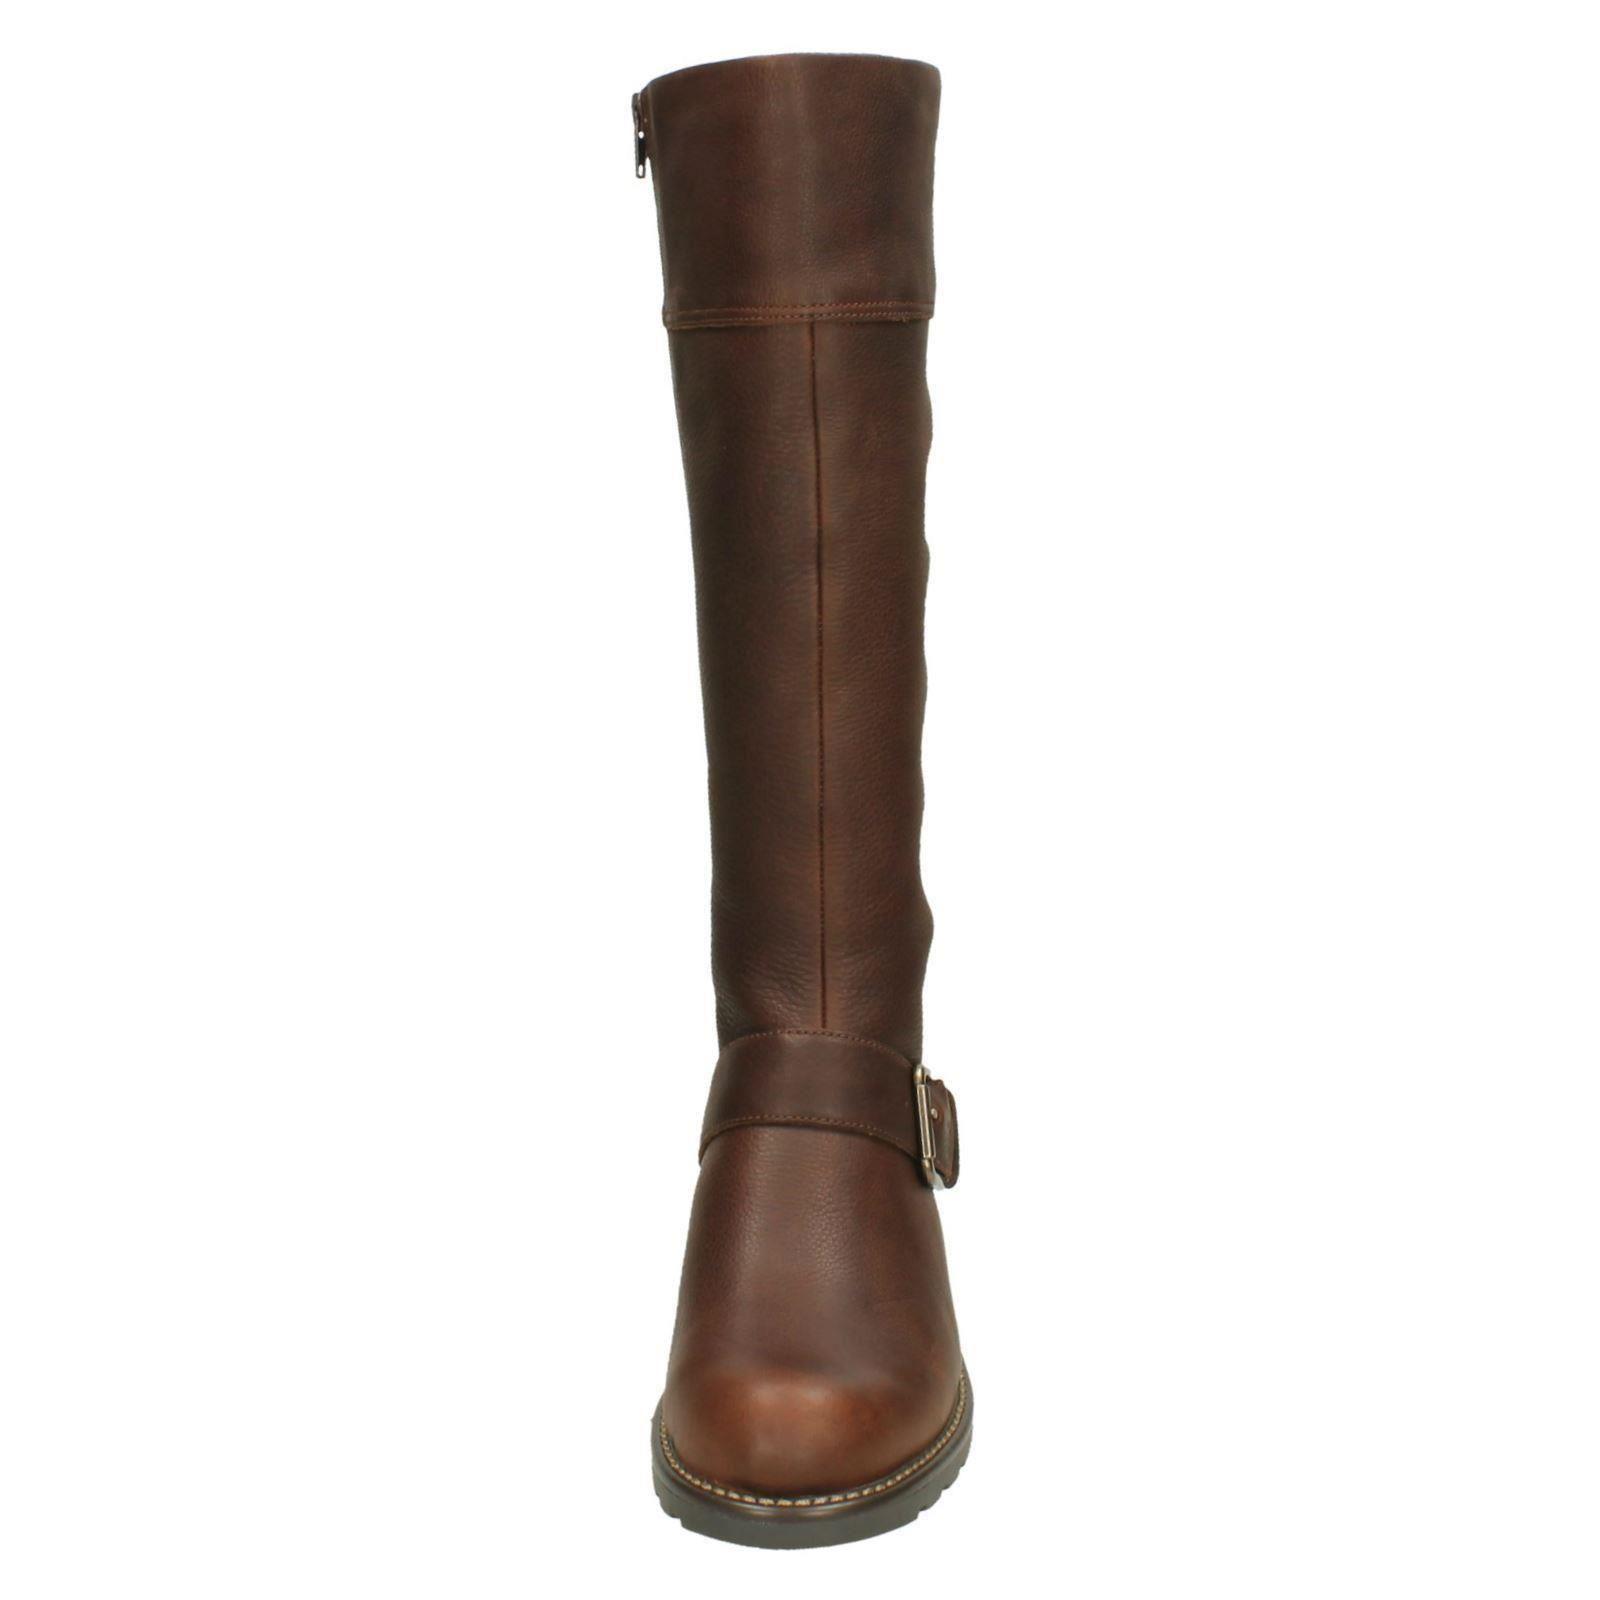 0a392905b612 Ladies-Clarks-Knee-High-Boots-039-Orinoco-Jazz-